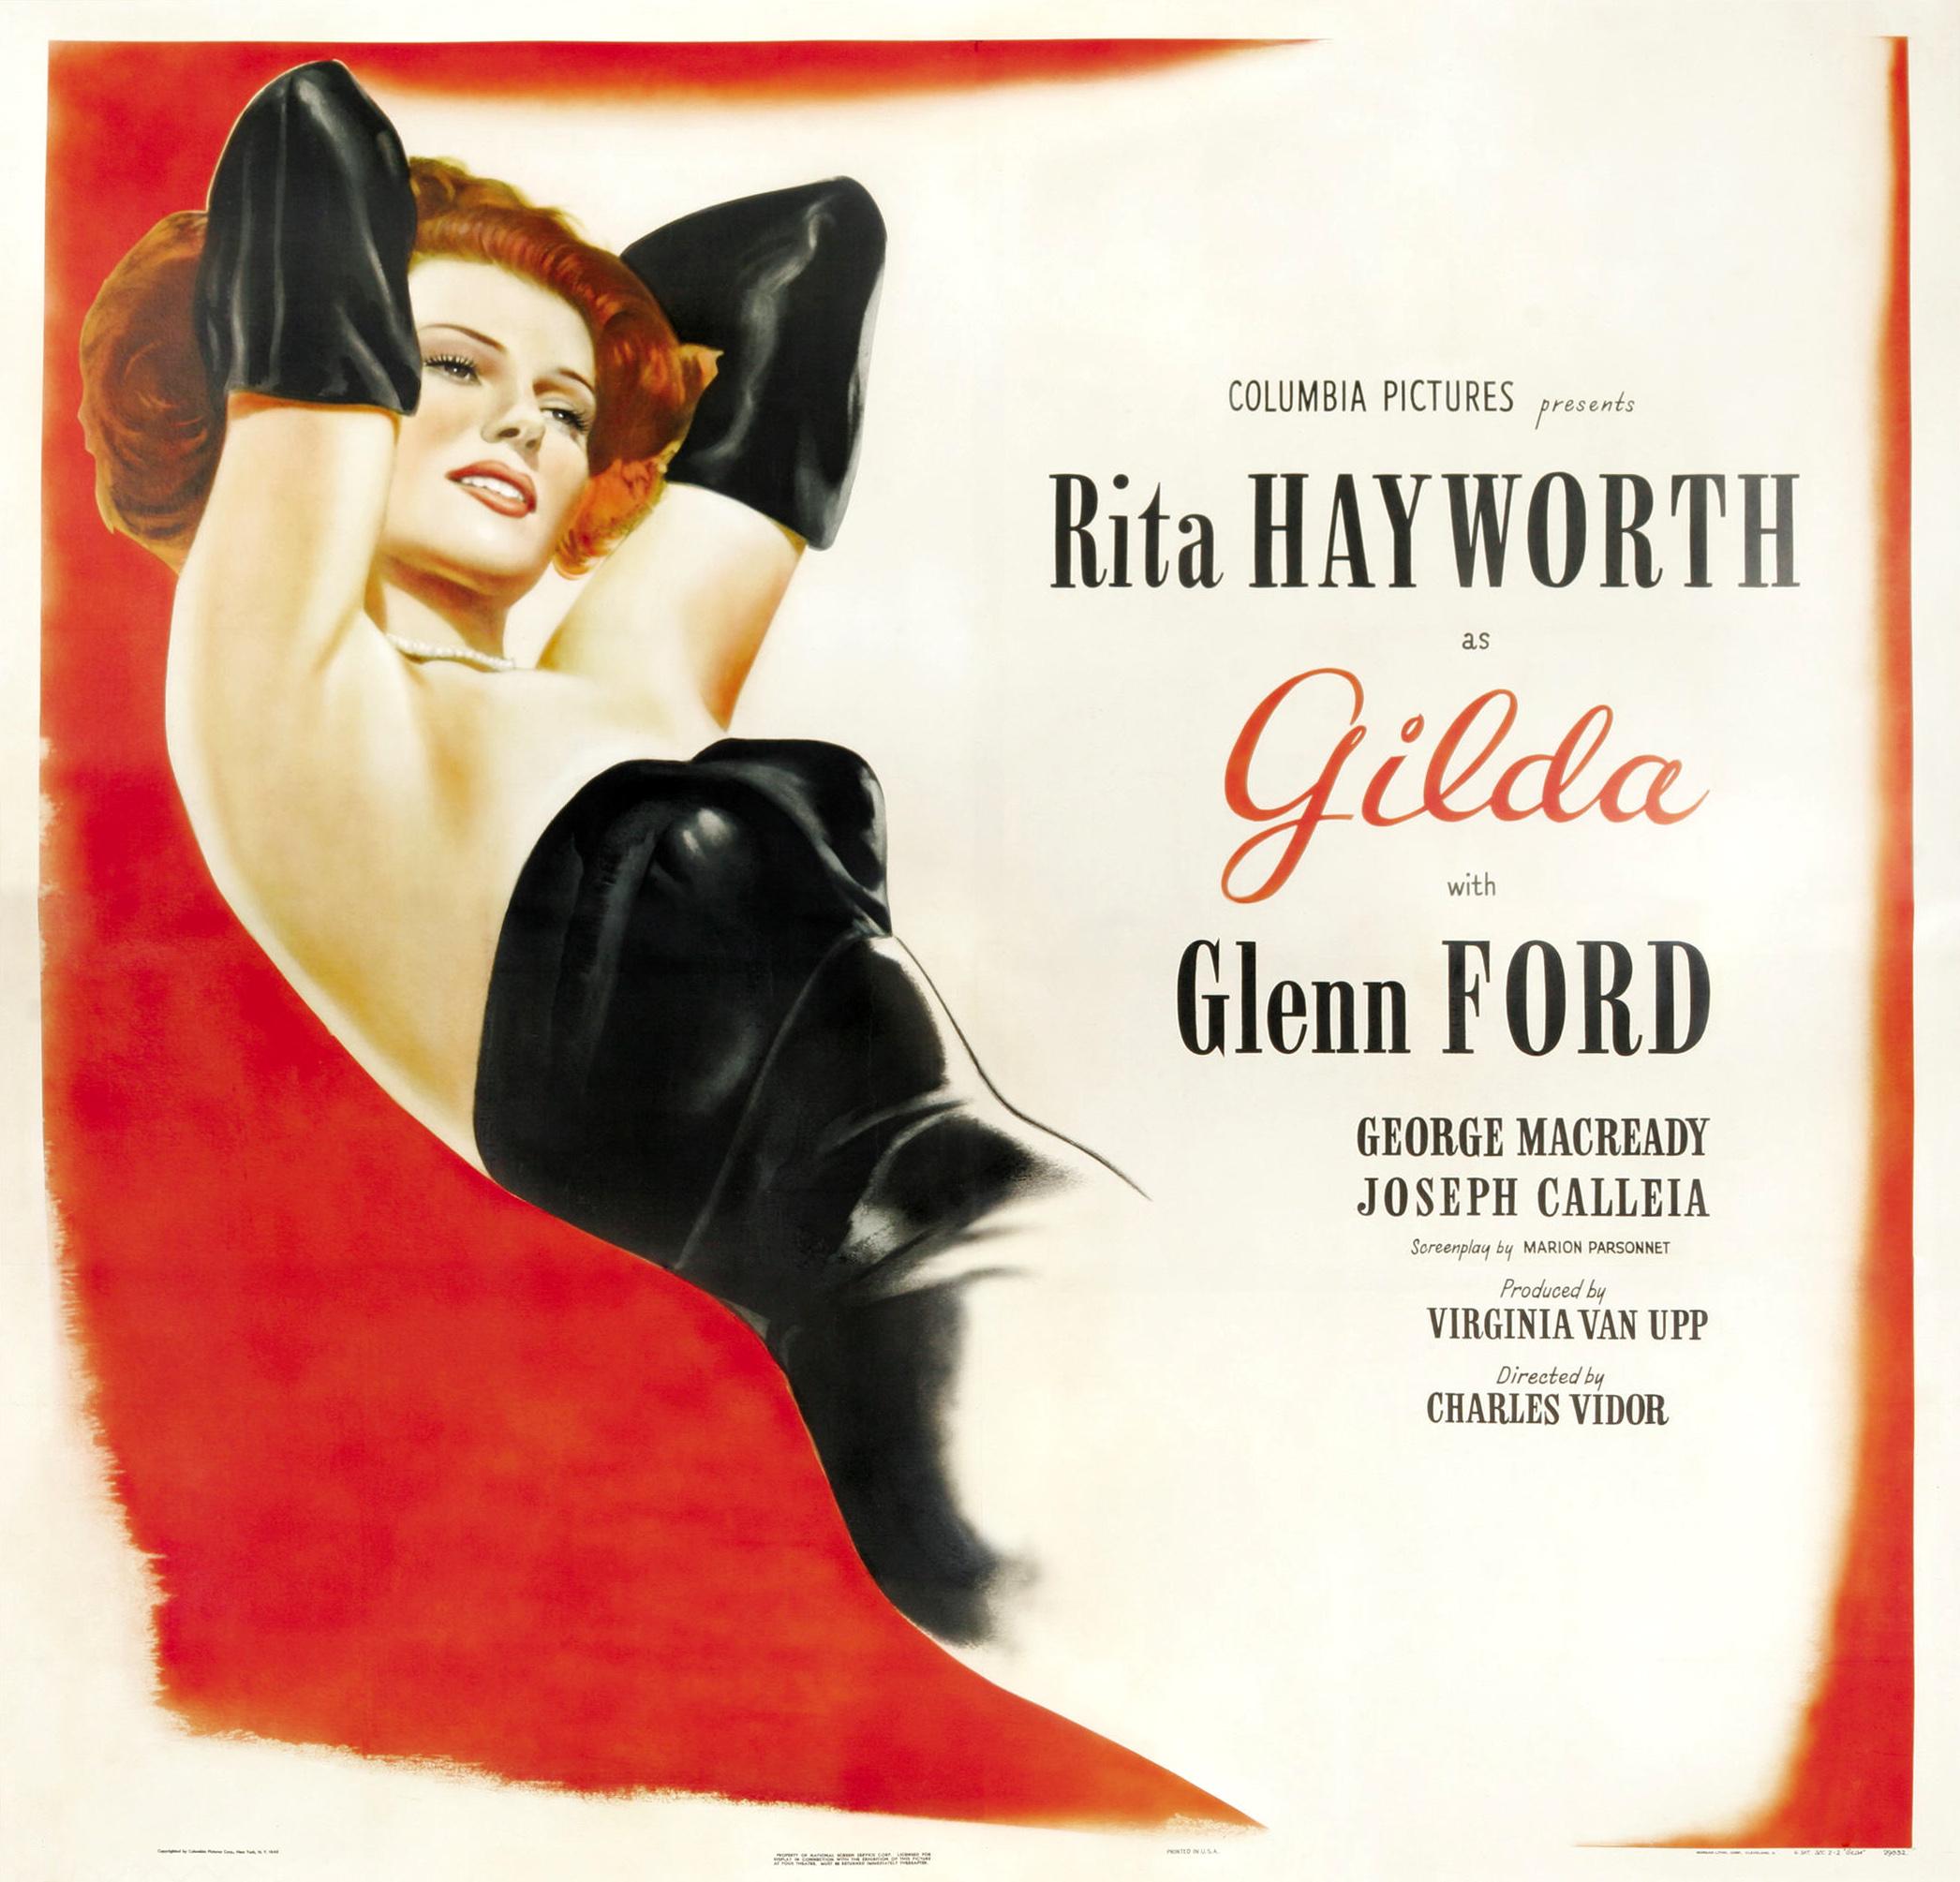 Lester Glenn Ford >> The Cult of the Love Goddess in America: Rita Hayworth, as ...